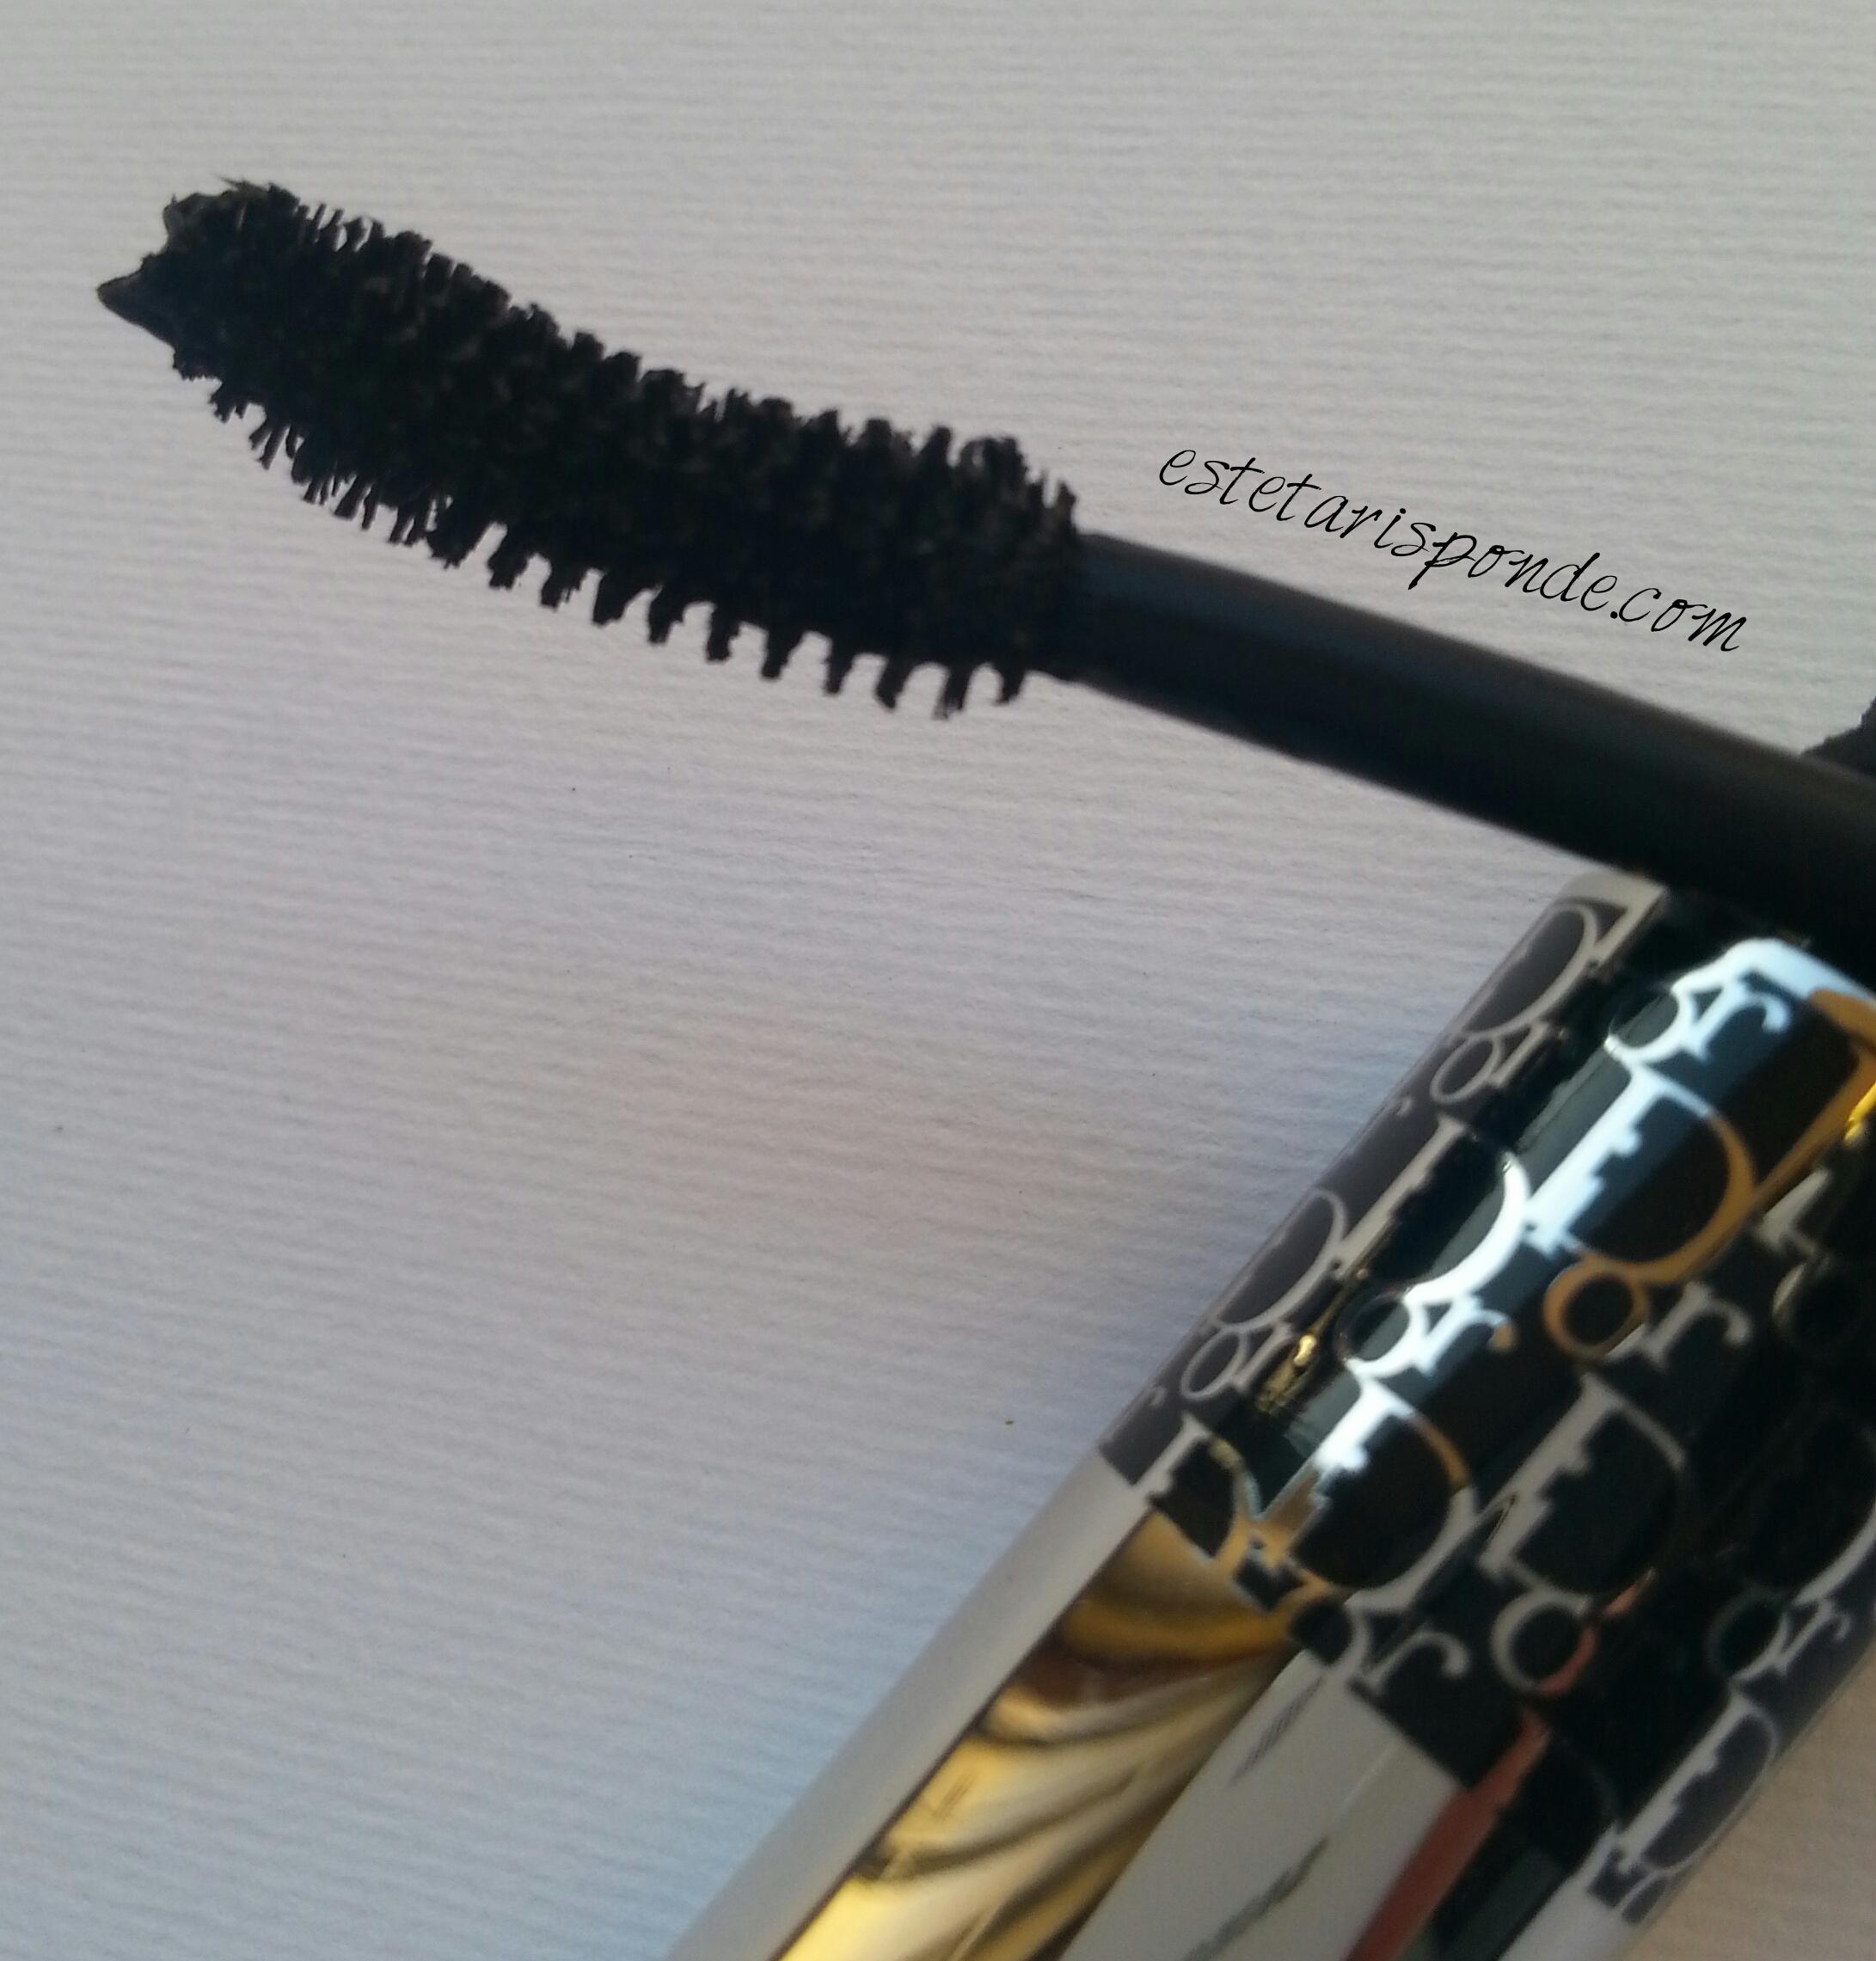 Iconic Overcurl Diorshow mascara